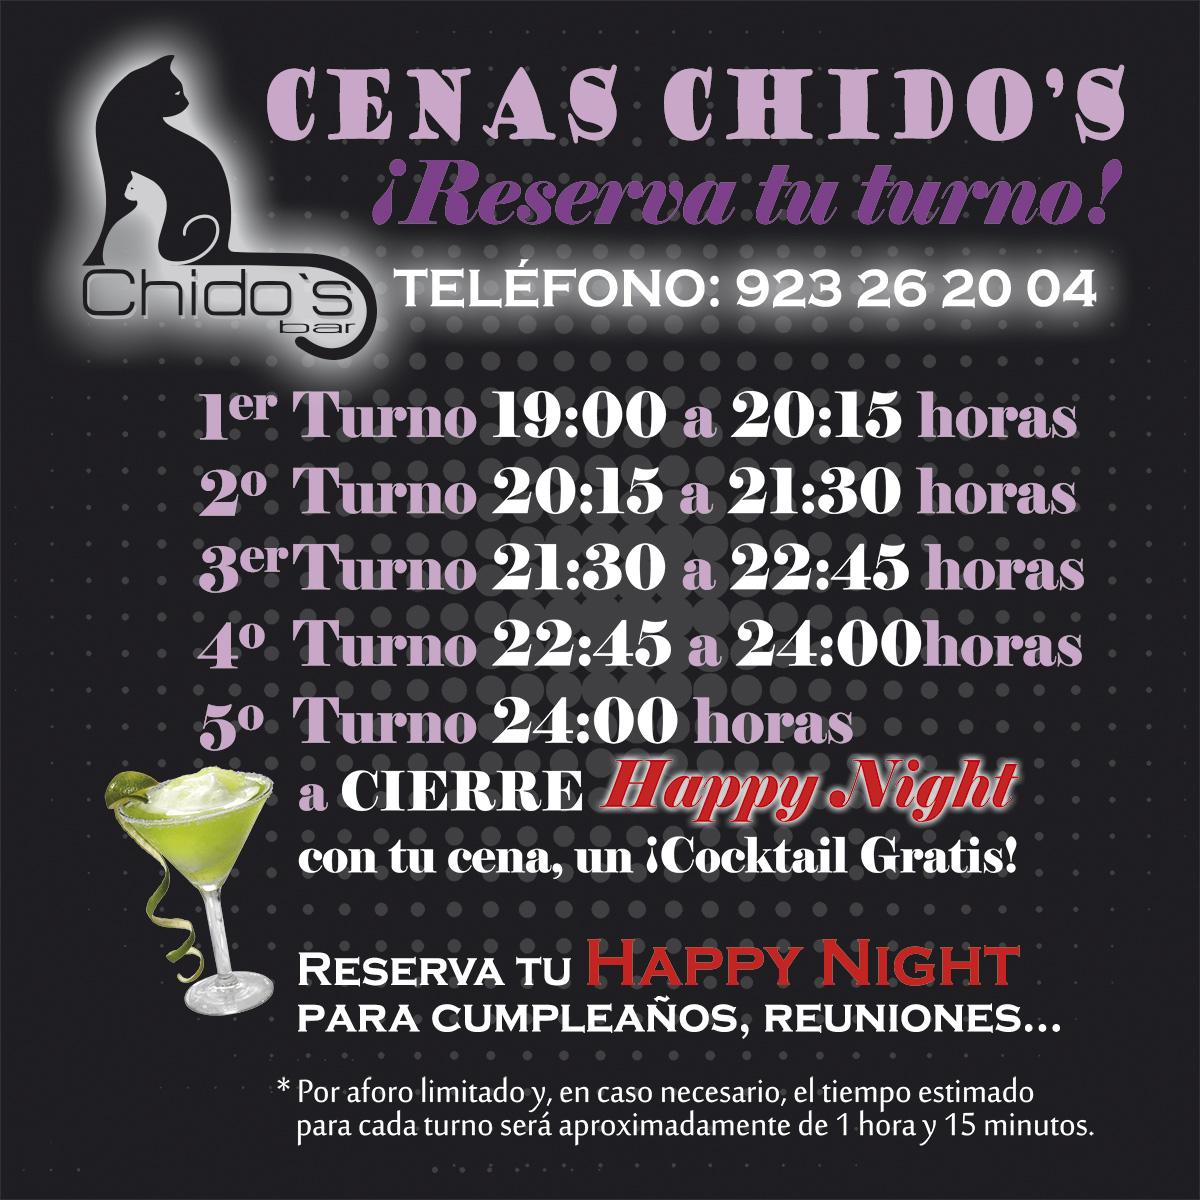 Cenas Chido's